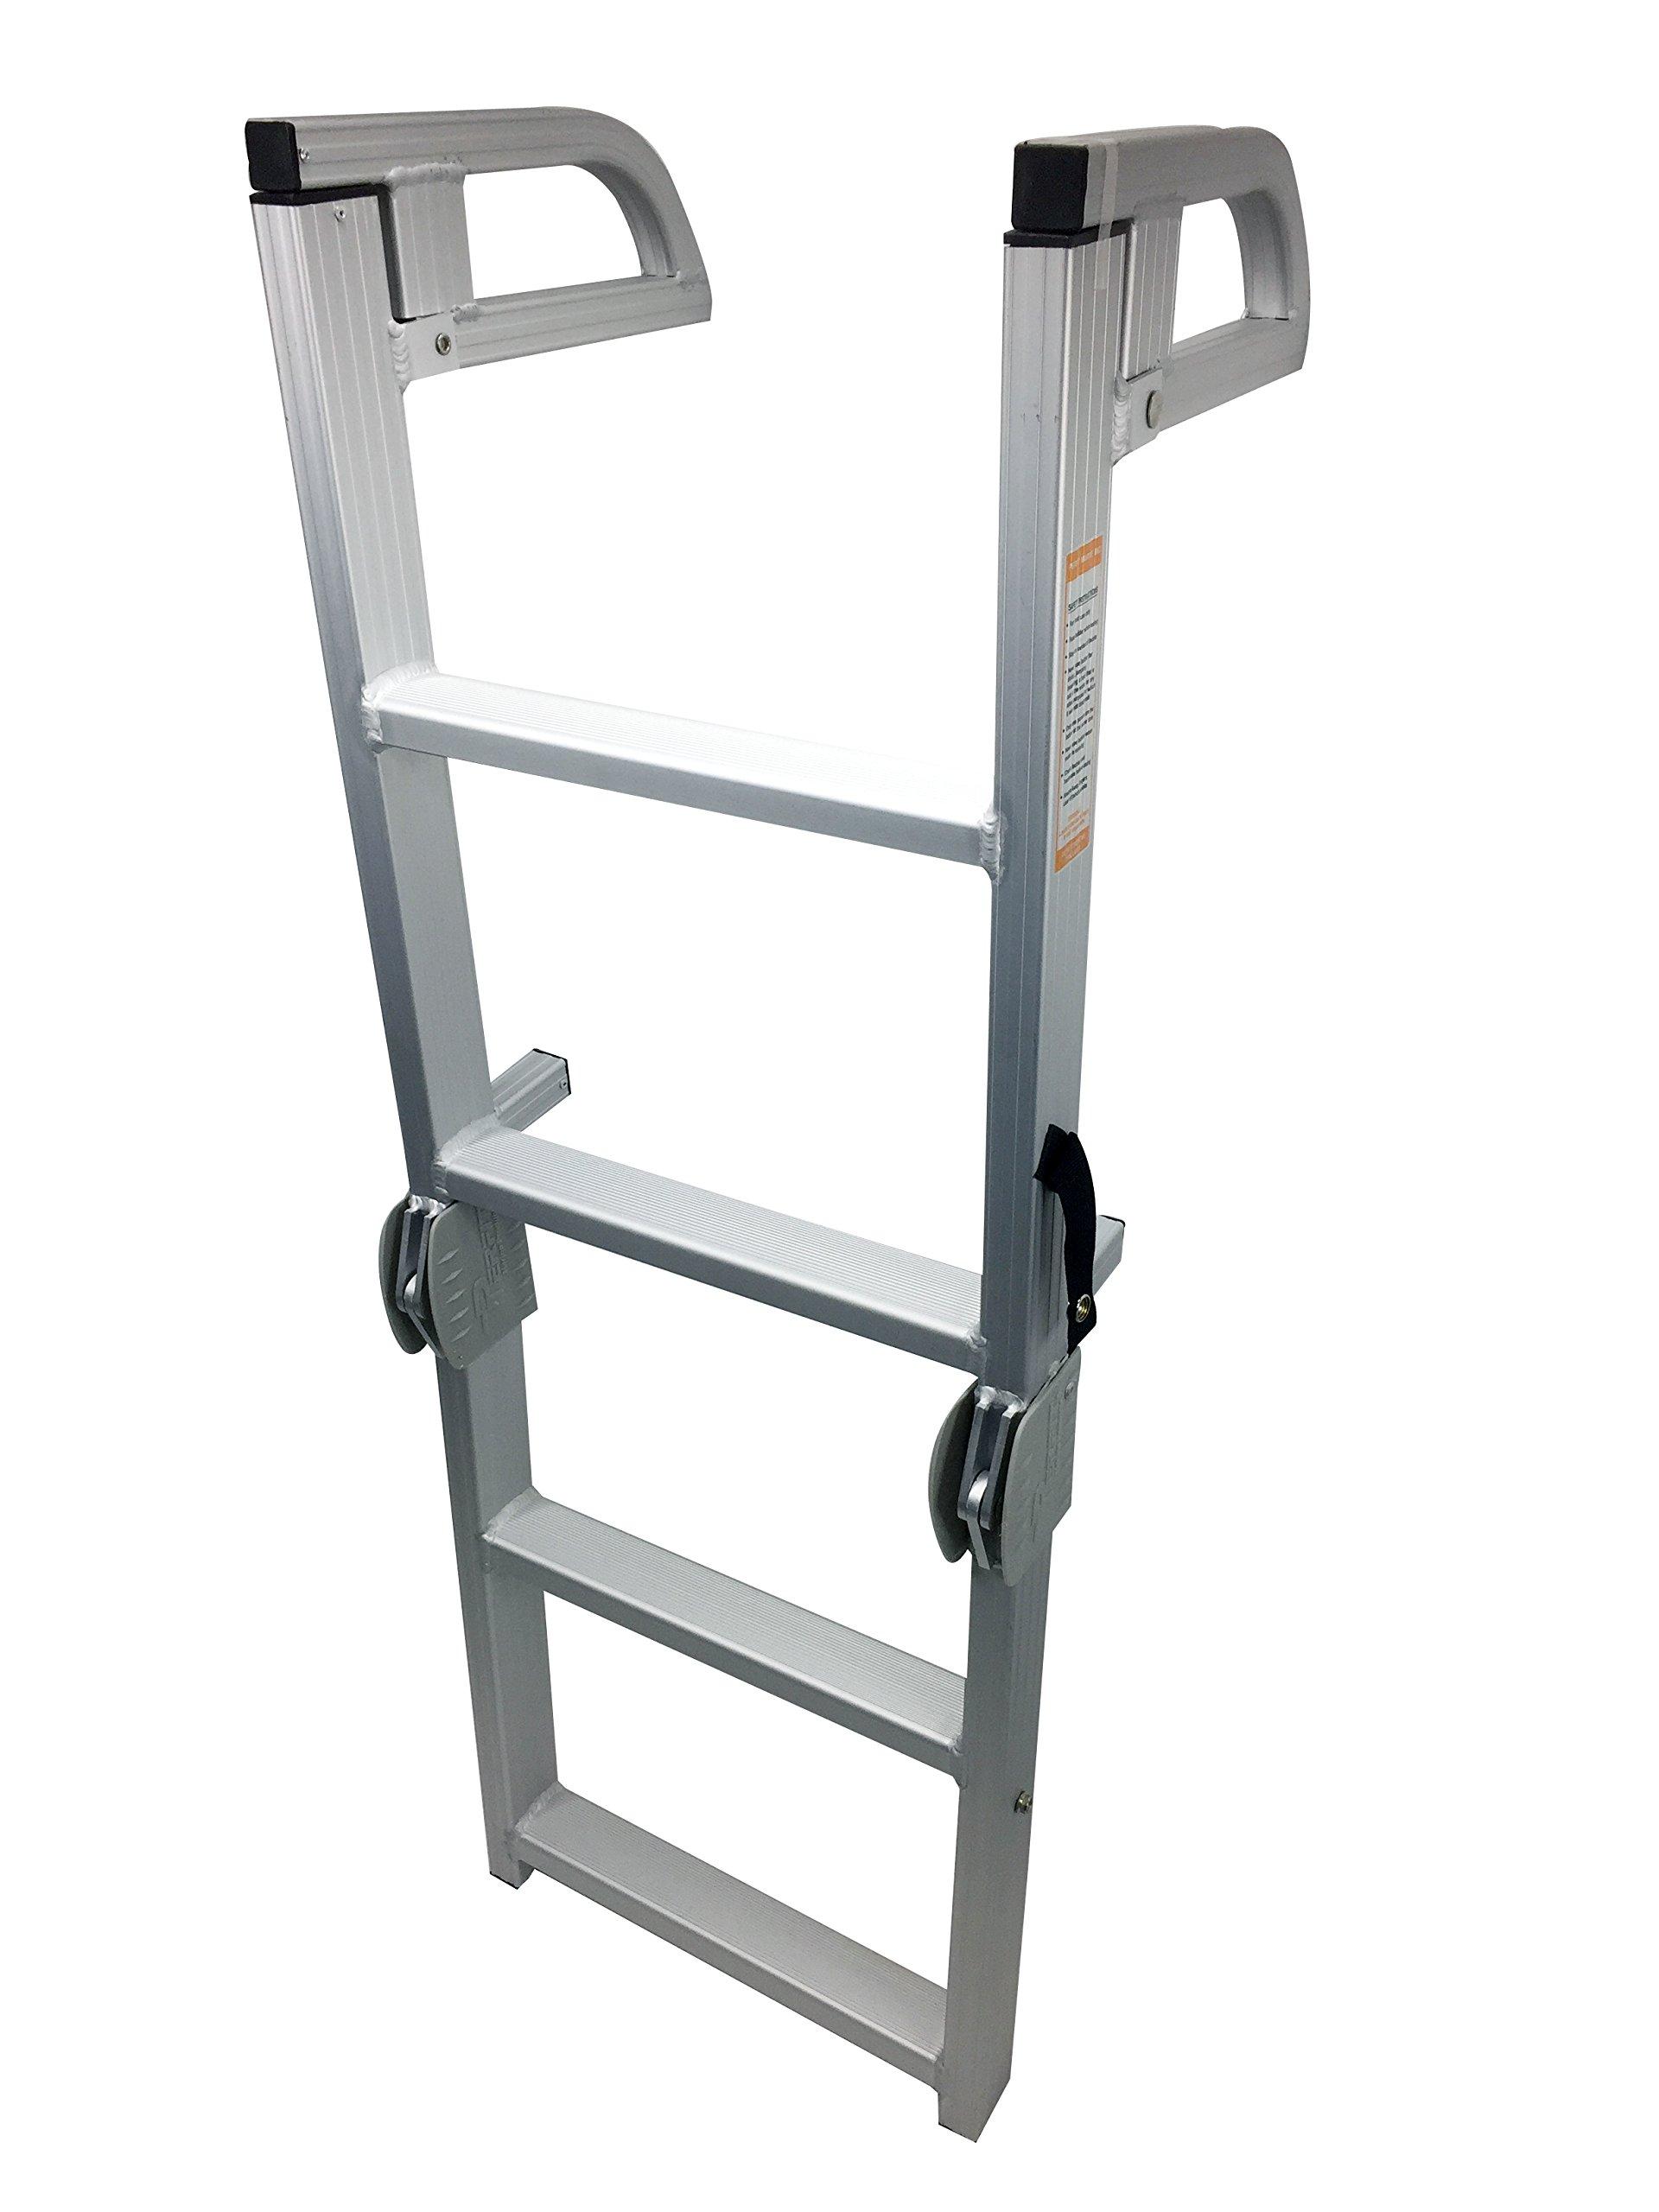 Pactrade Marine Pontoon Boat Folding Boarding 4-step Ladder Aluminum